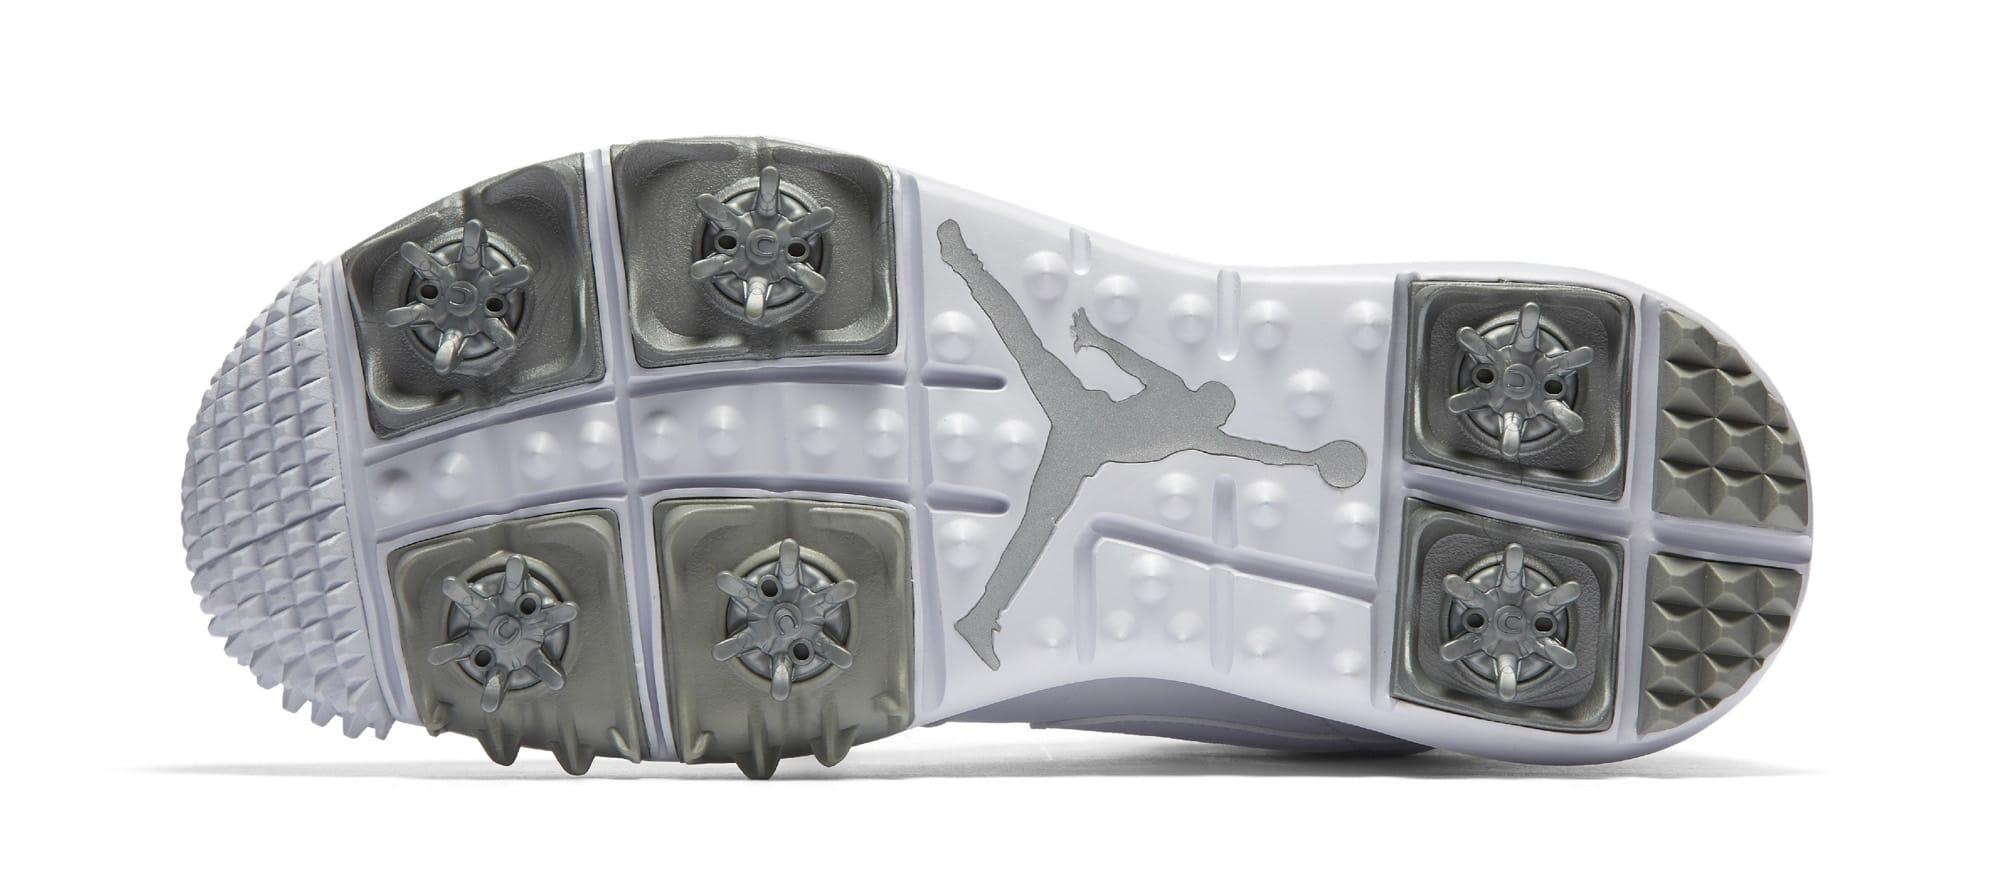 77bb402ed04fd2 Image via Nike White Air Jordan 1 Golf Sole